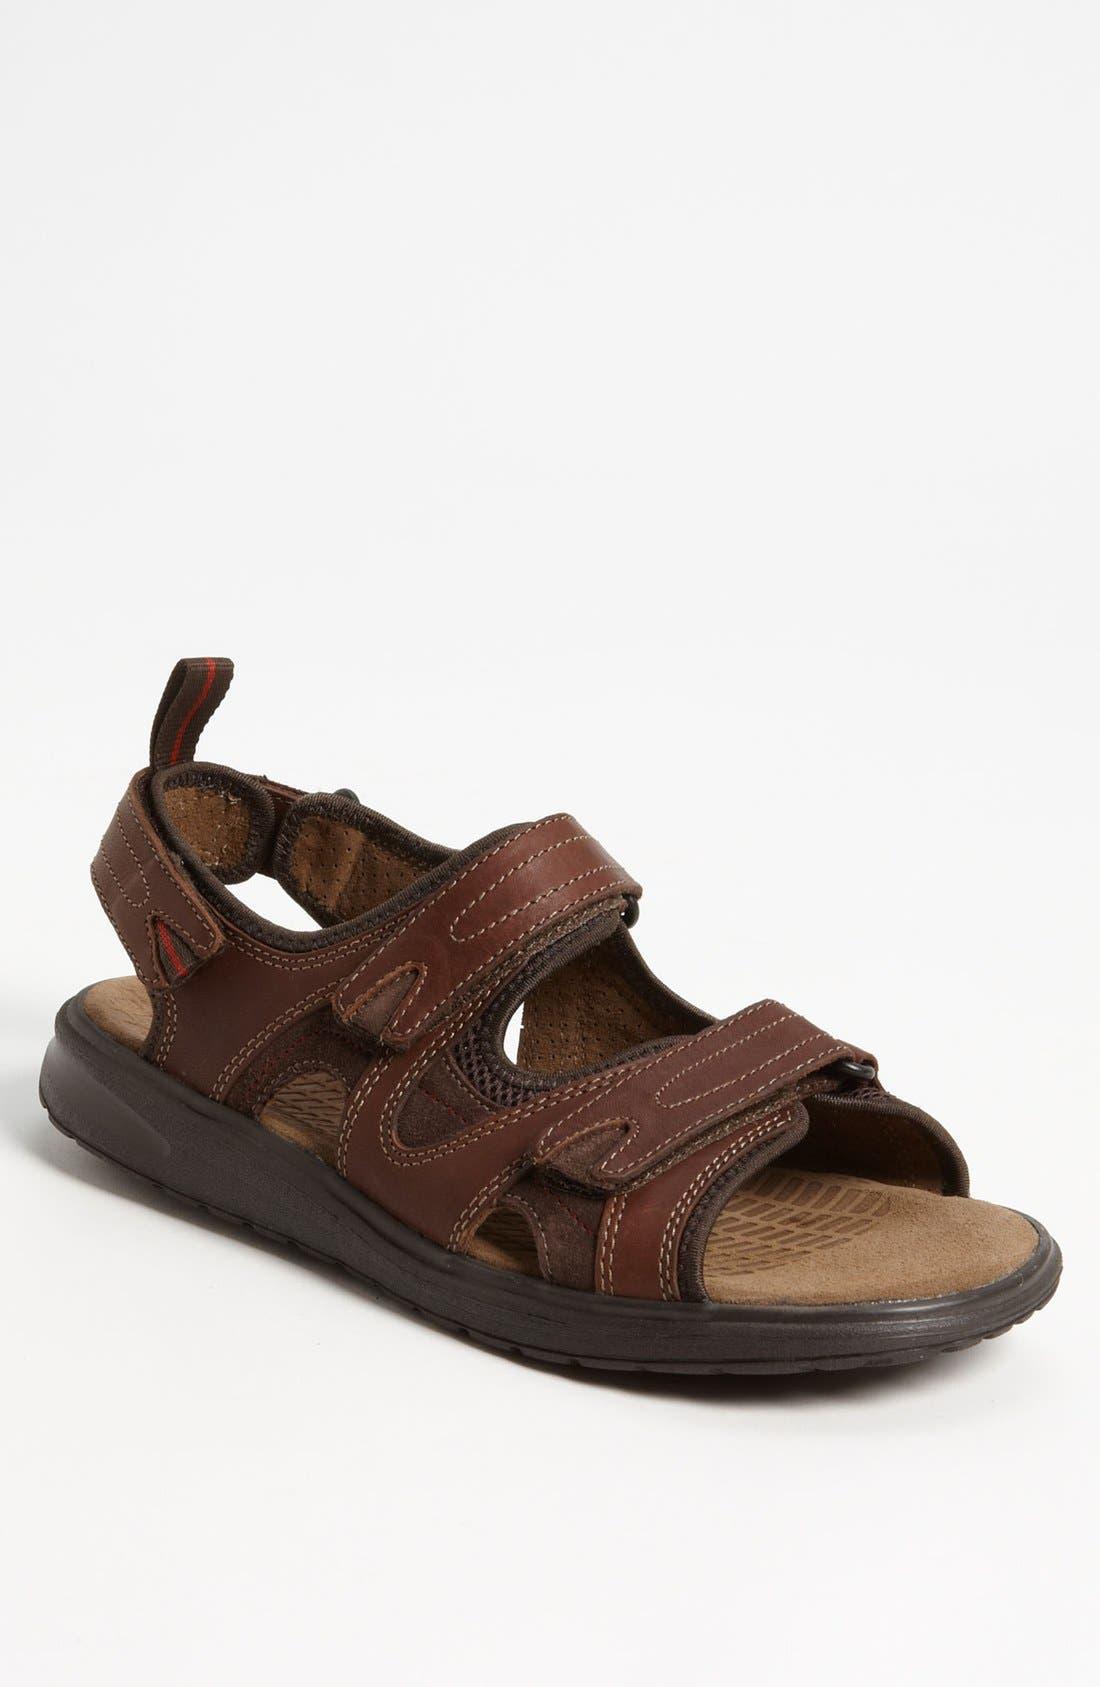 Main Image - Clarks® 'Unstructured - Caicos' Sandal   (Men)